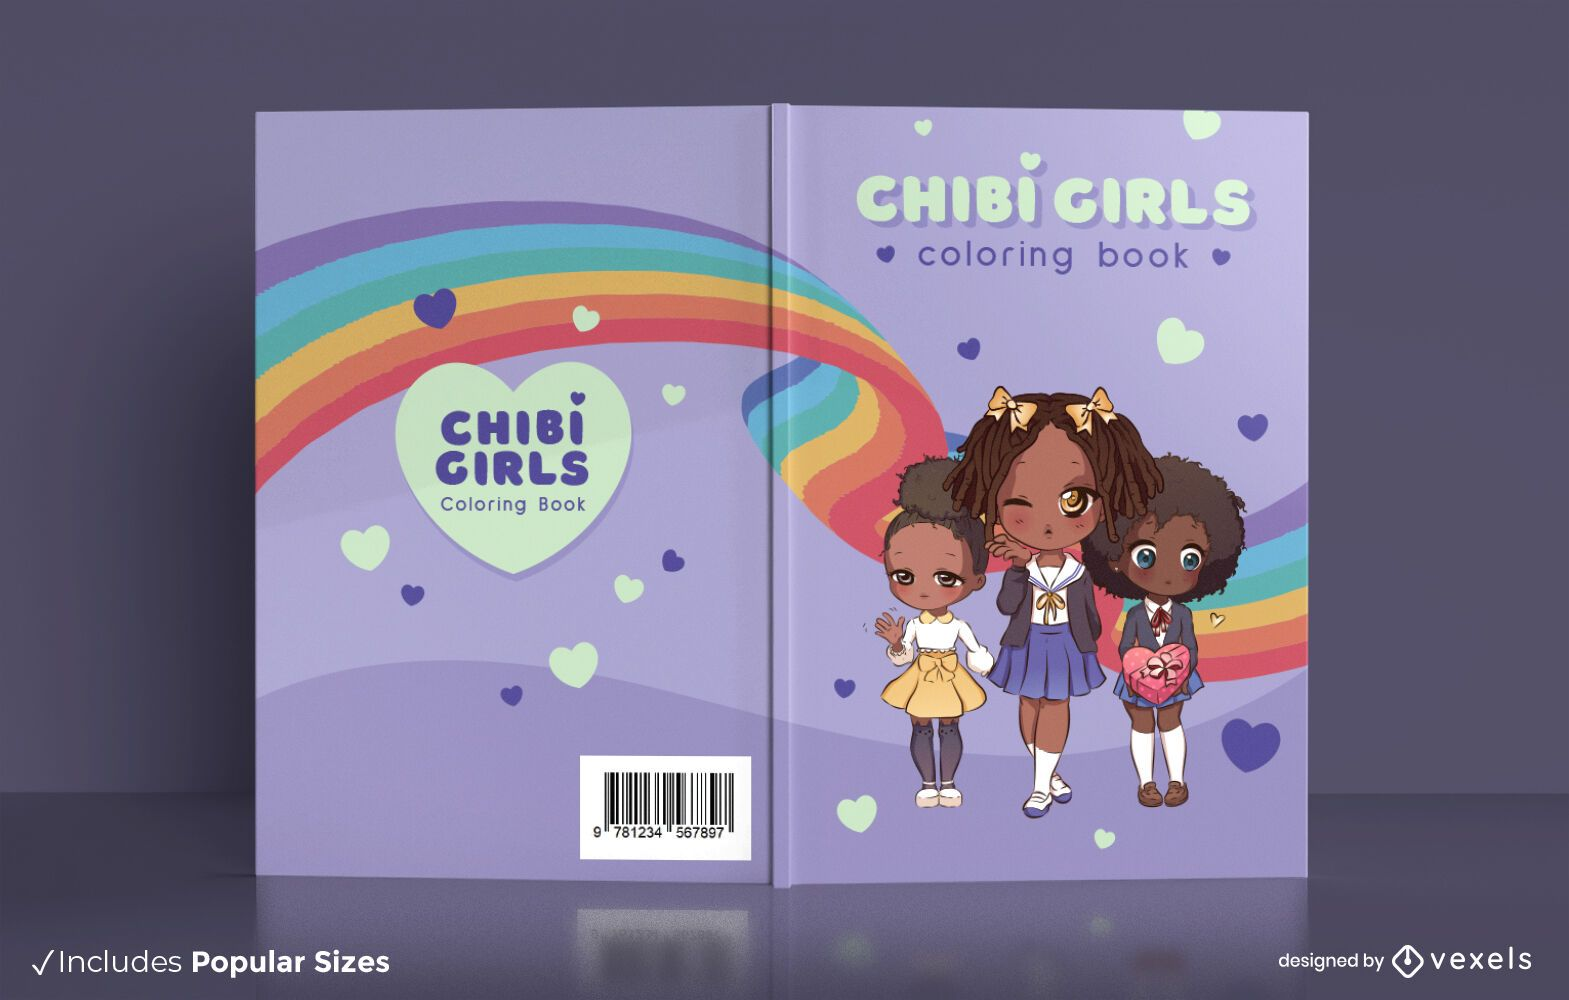 Chibi girls coloring book cover design